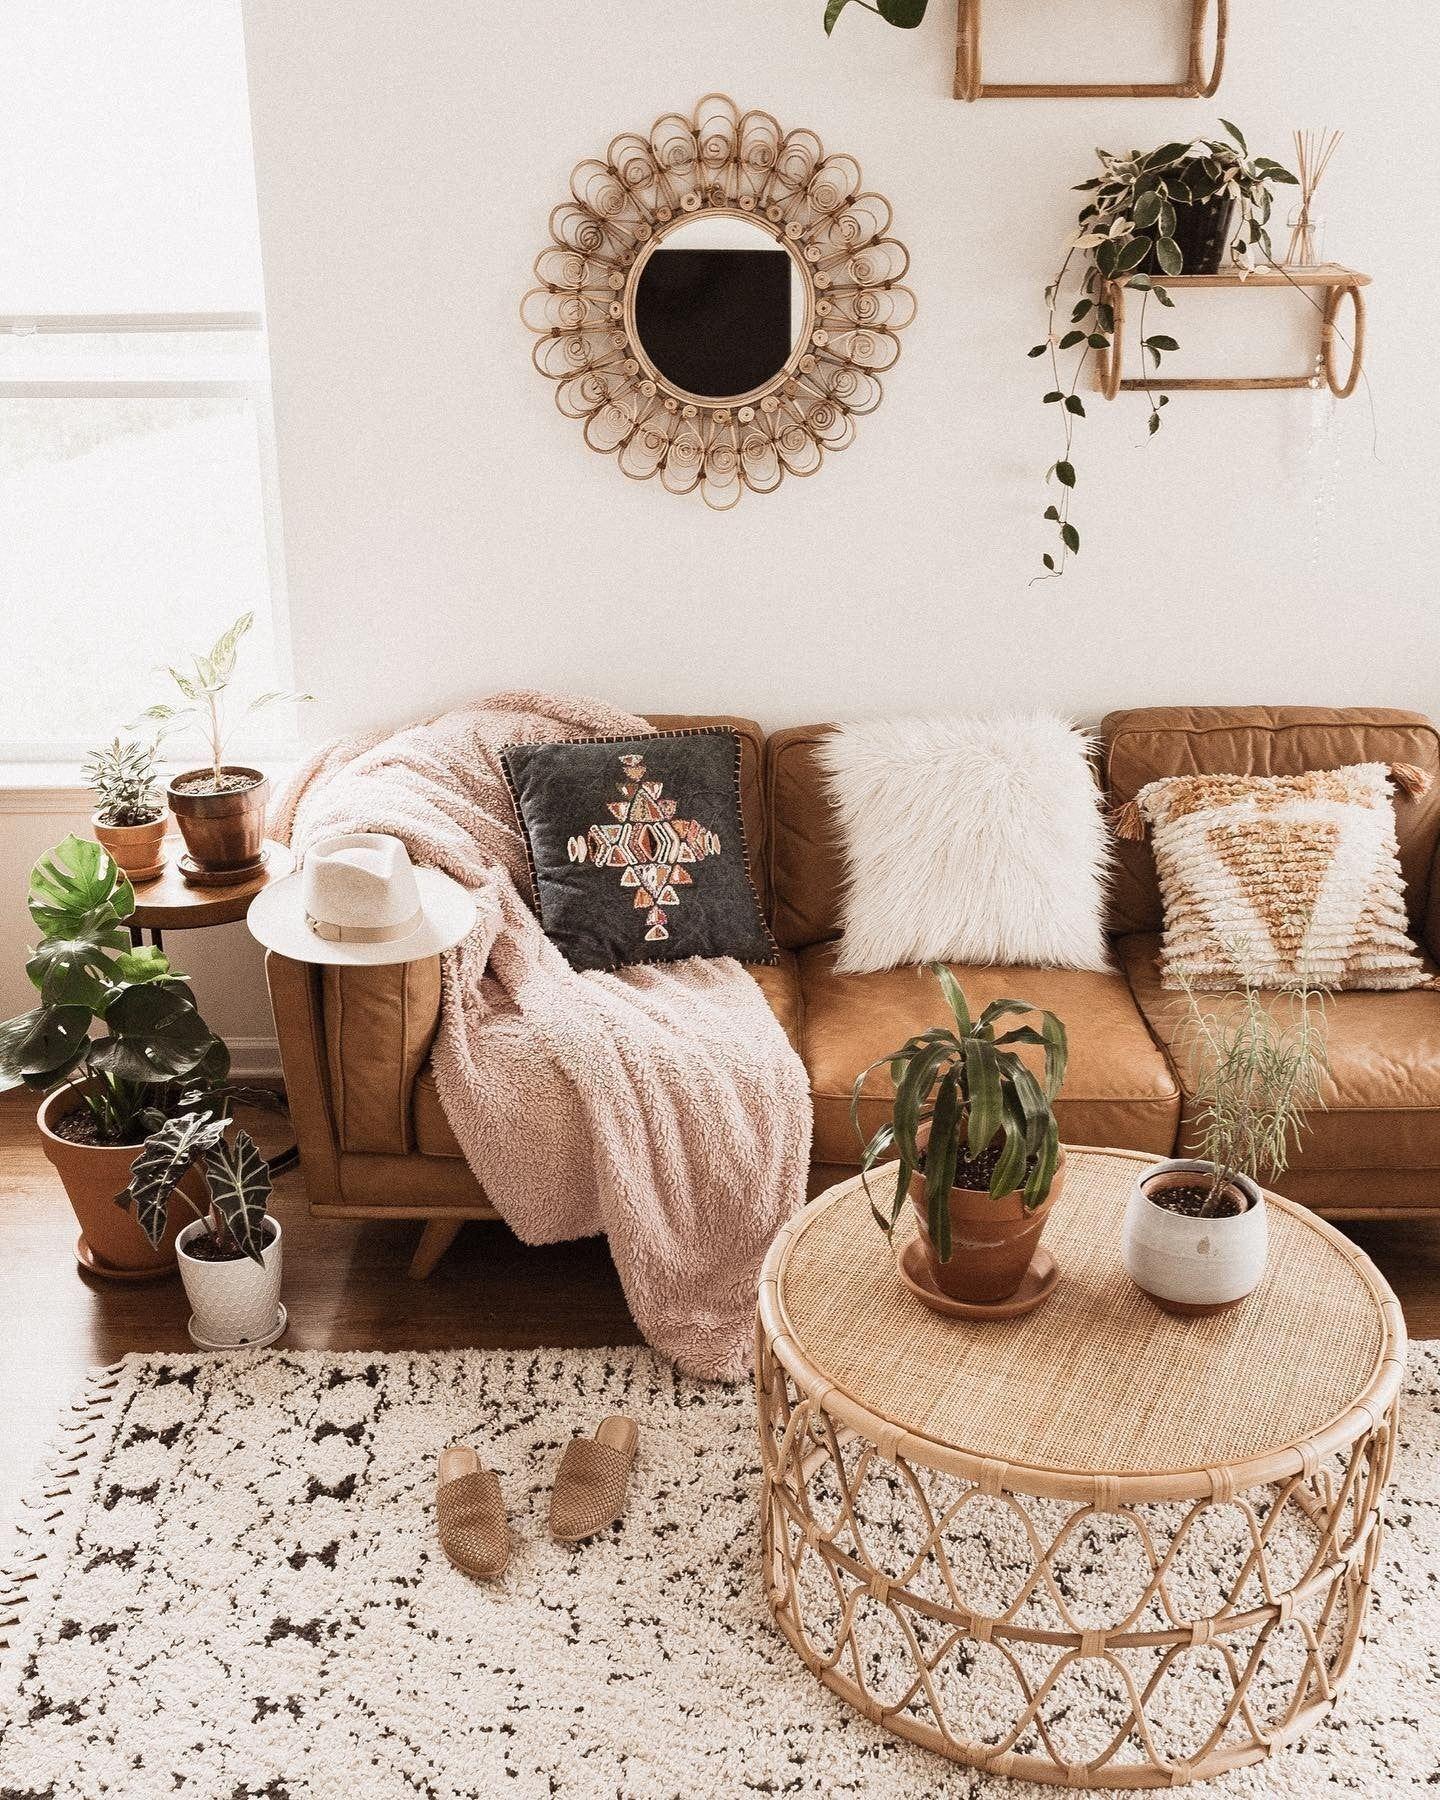 Timber Charme Tan Sofa In 2020 Boho Living Room Urban